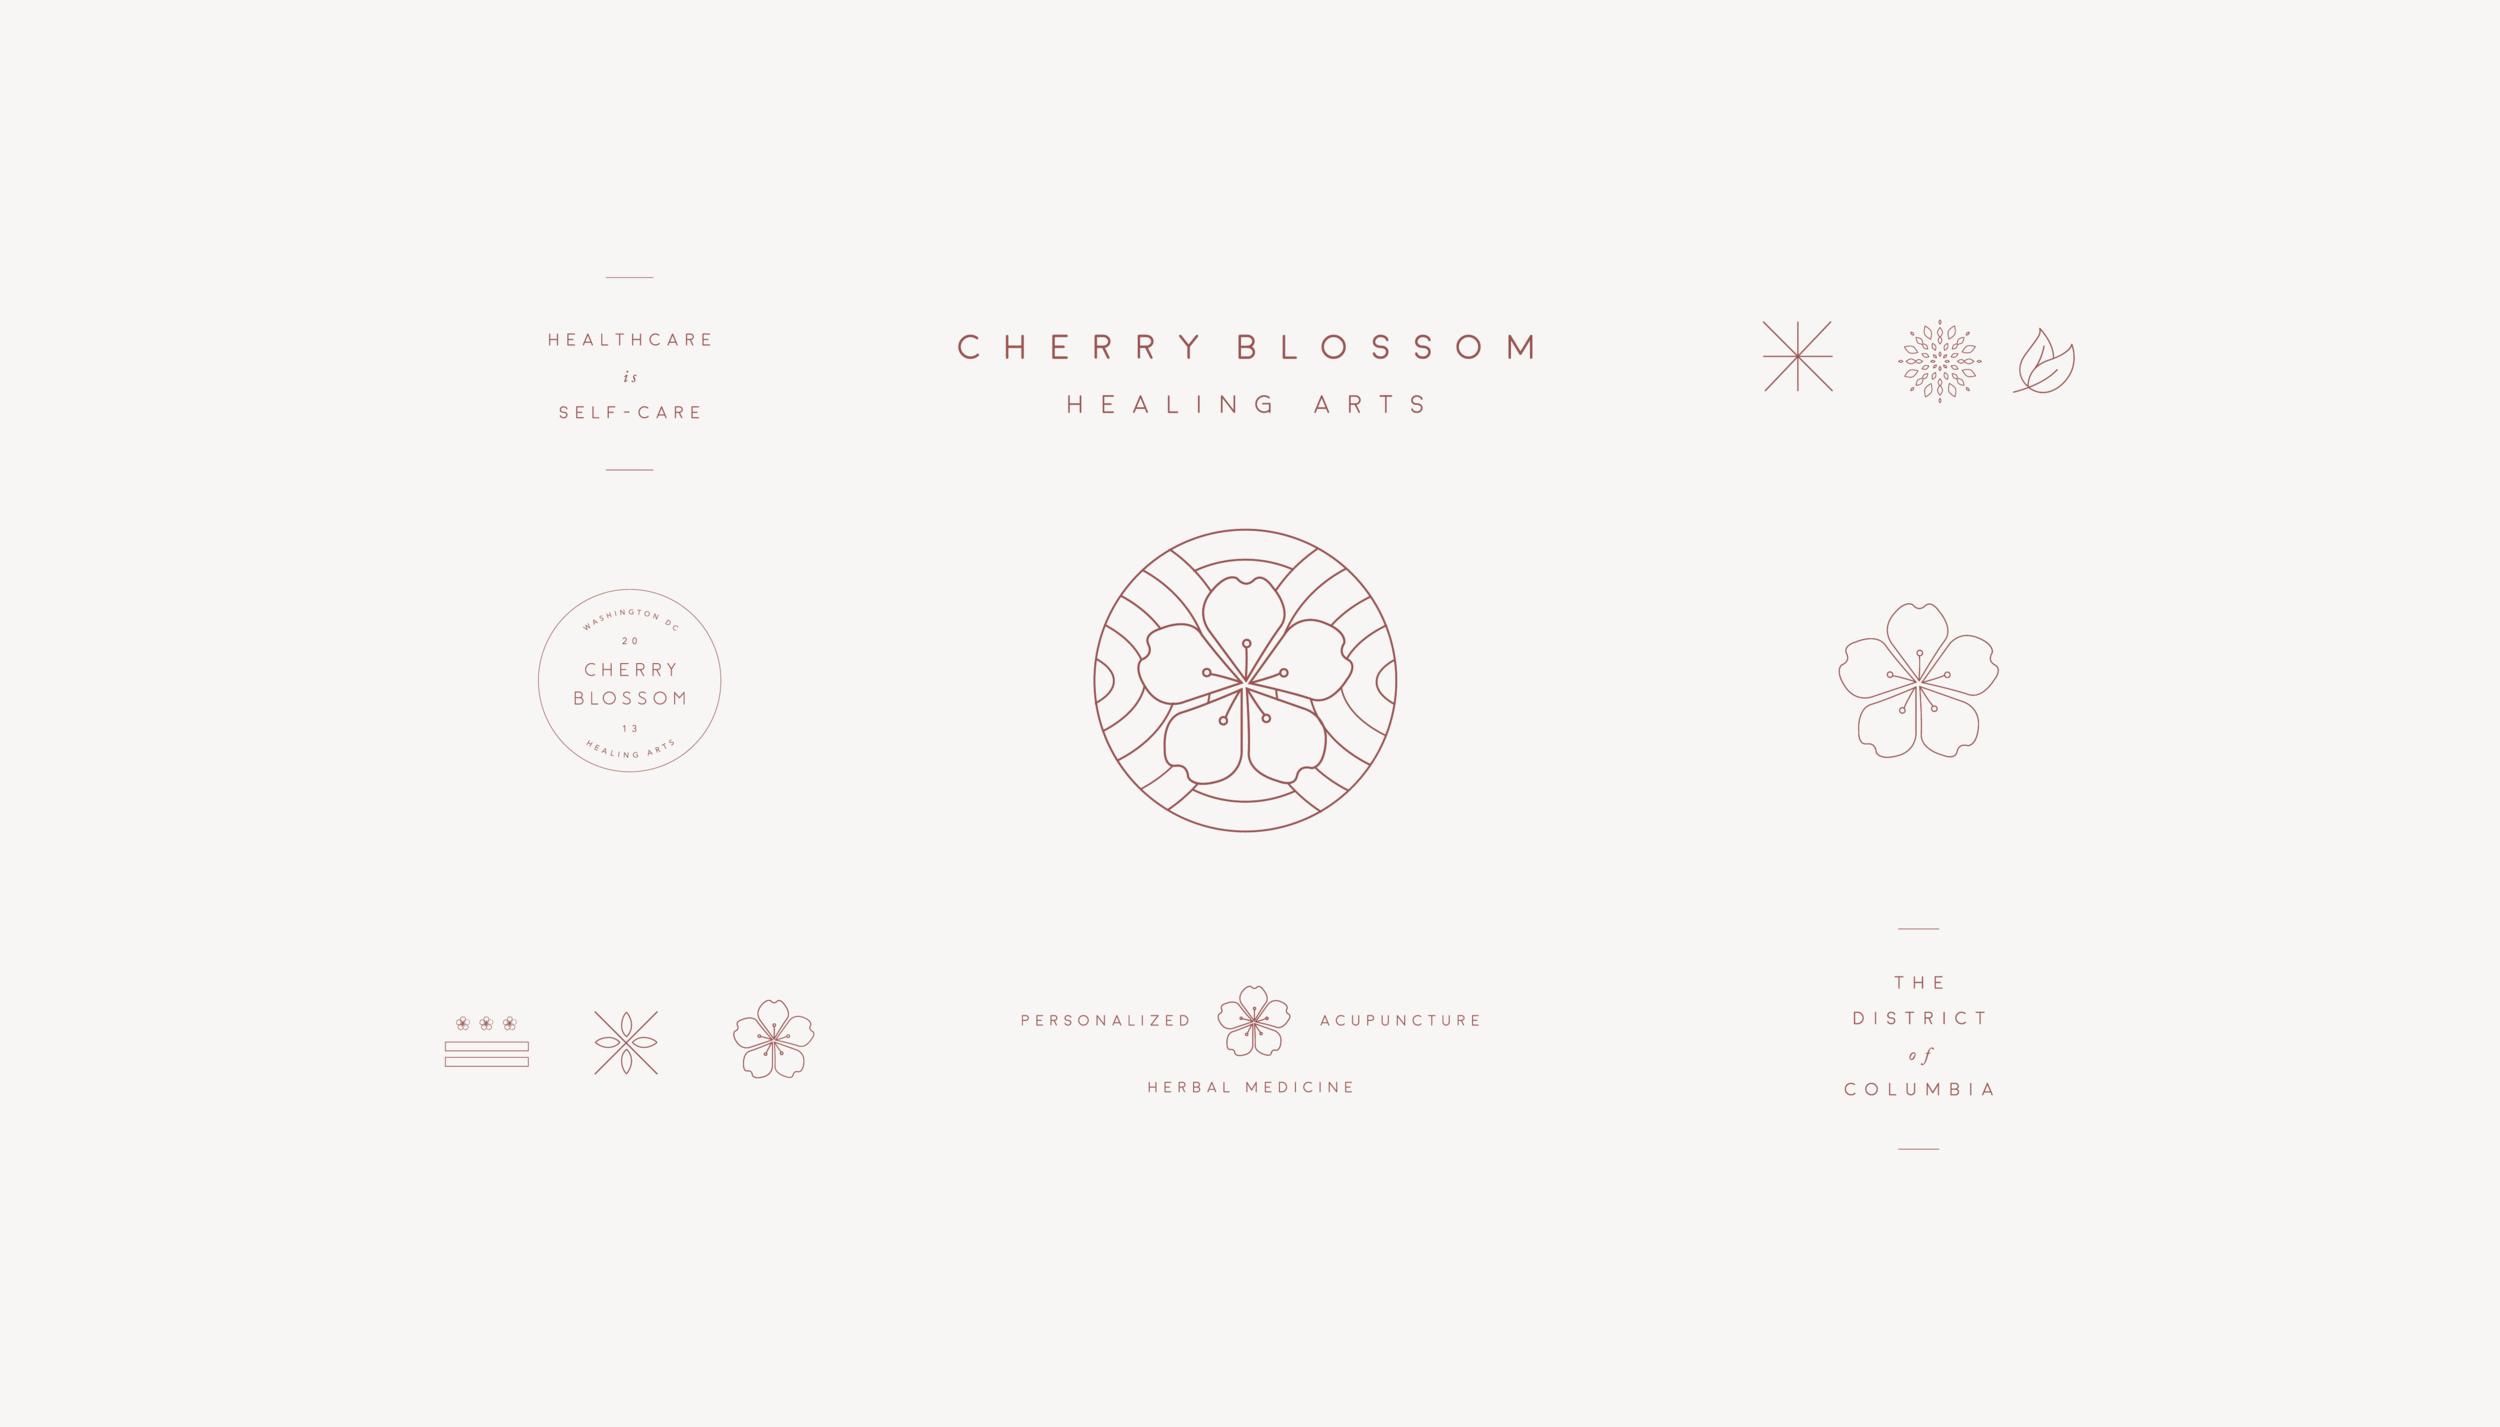 CBha+design+elements+branding+studio+antheia.png